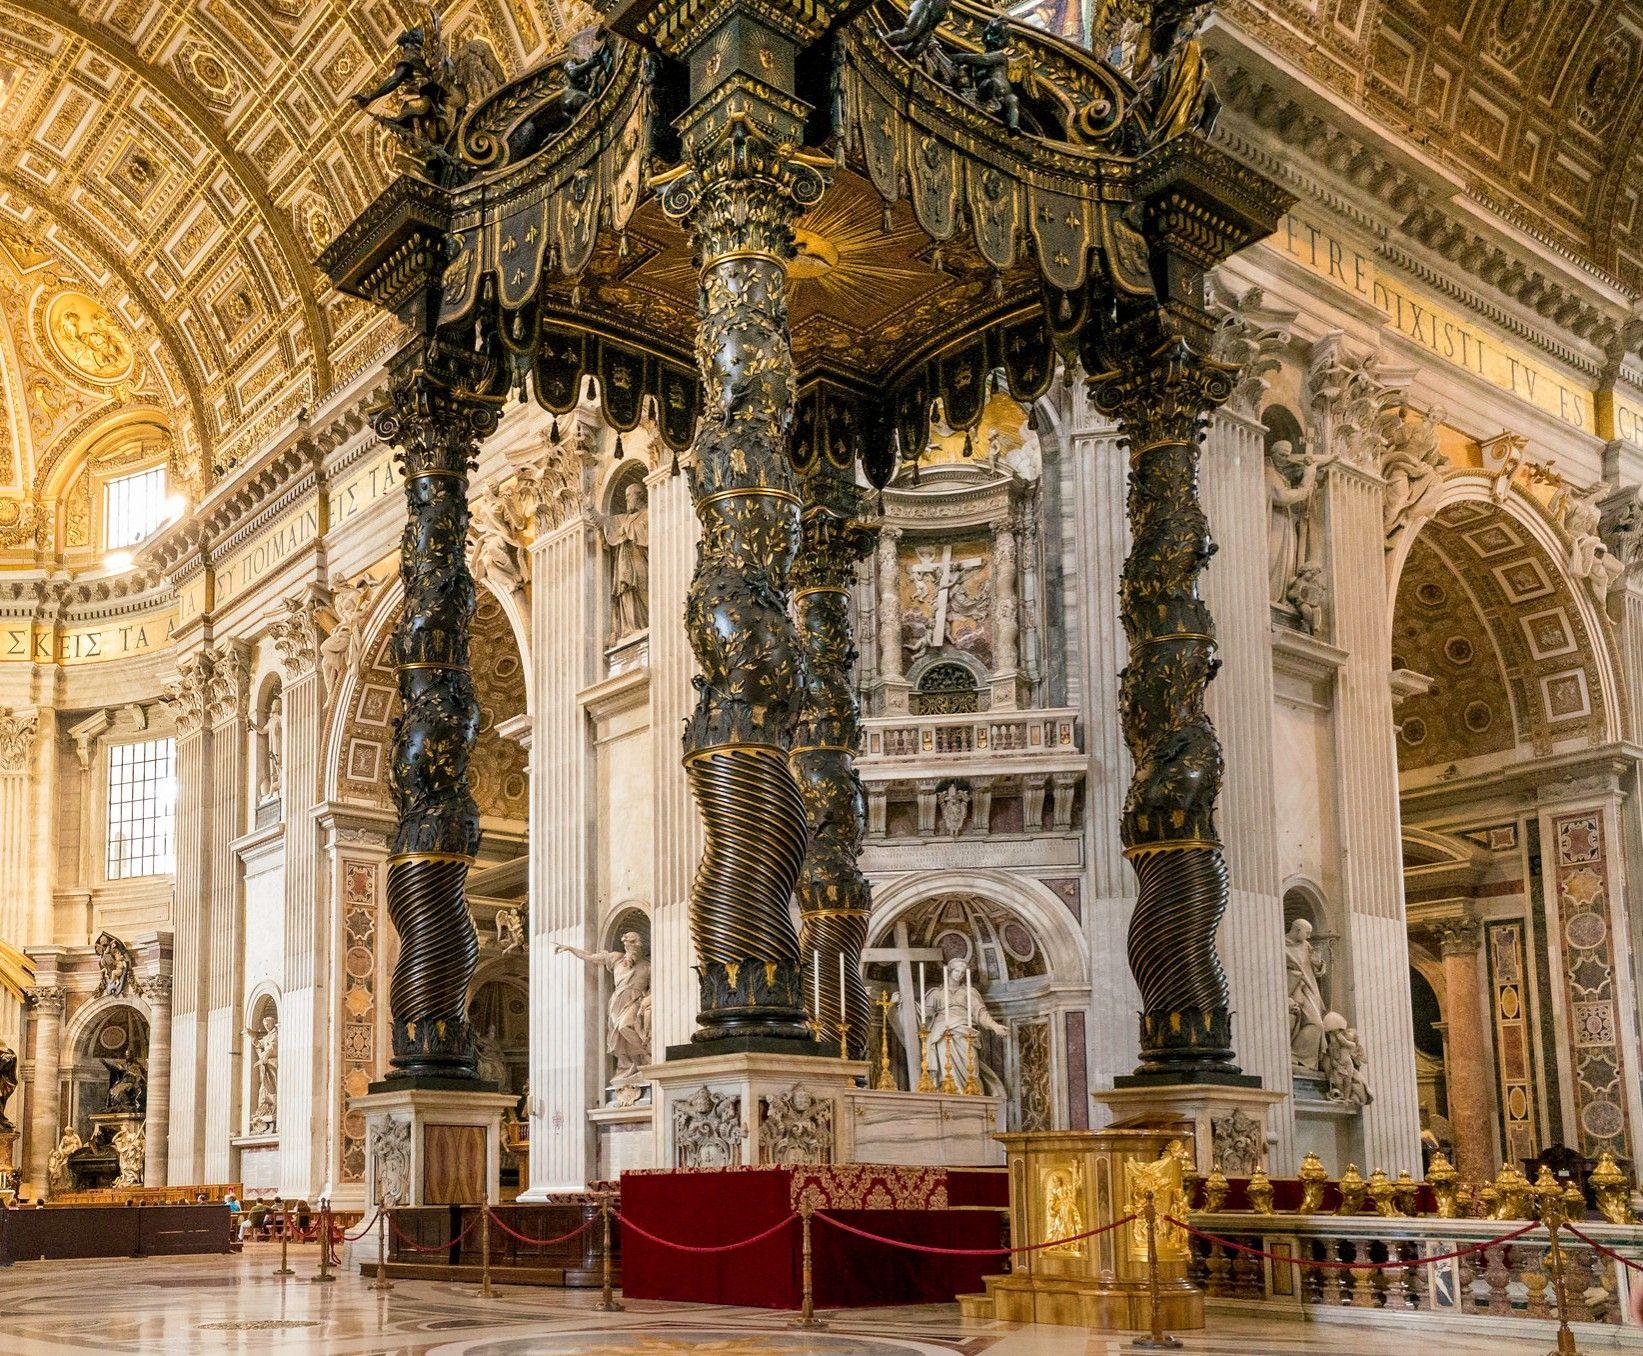 St. Peter's Baldachin (Italian baldacchino) is a large